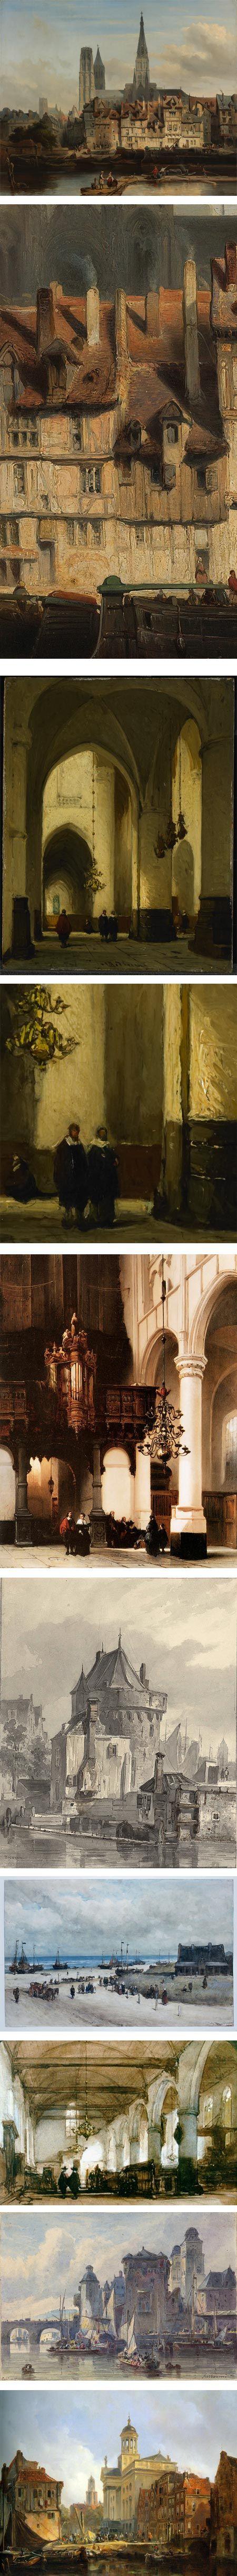 Nineteenth century painter Johannes Bosboom